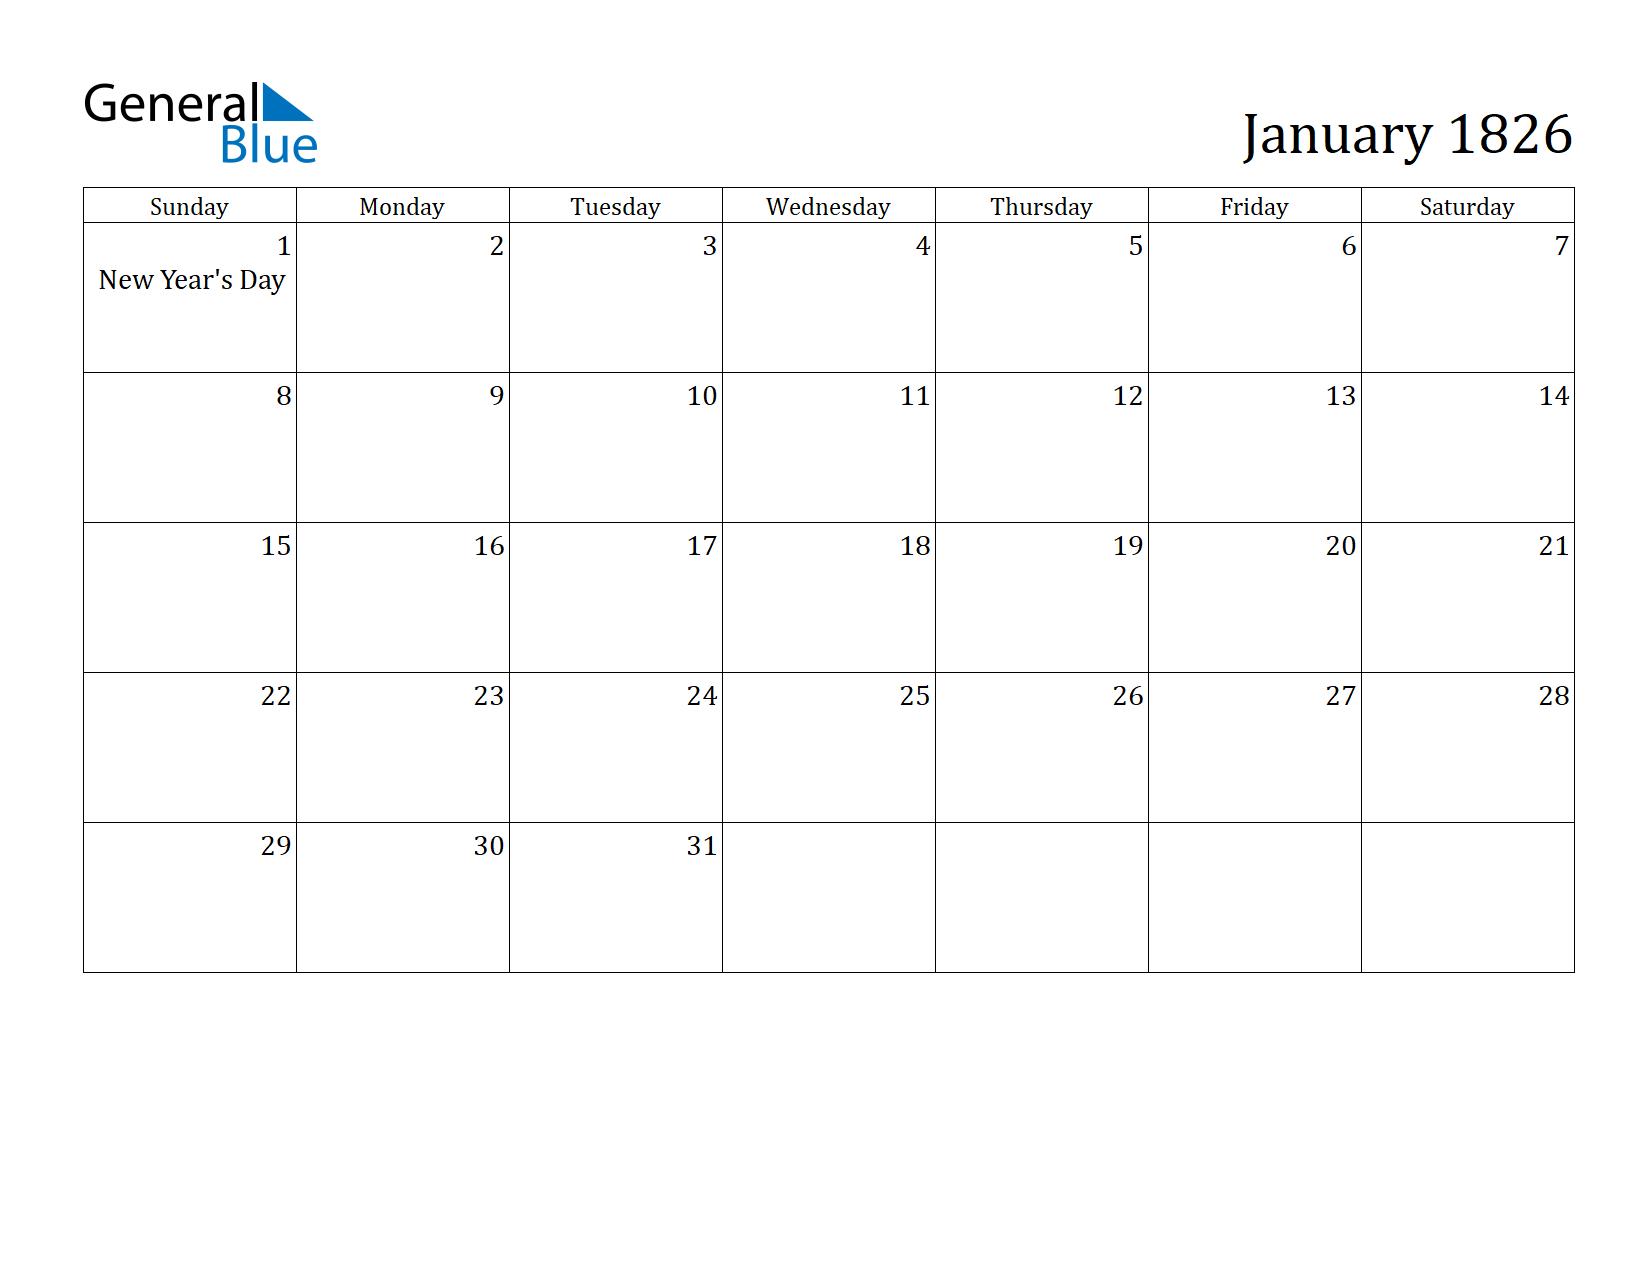 Image of January 1826 Calendar